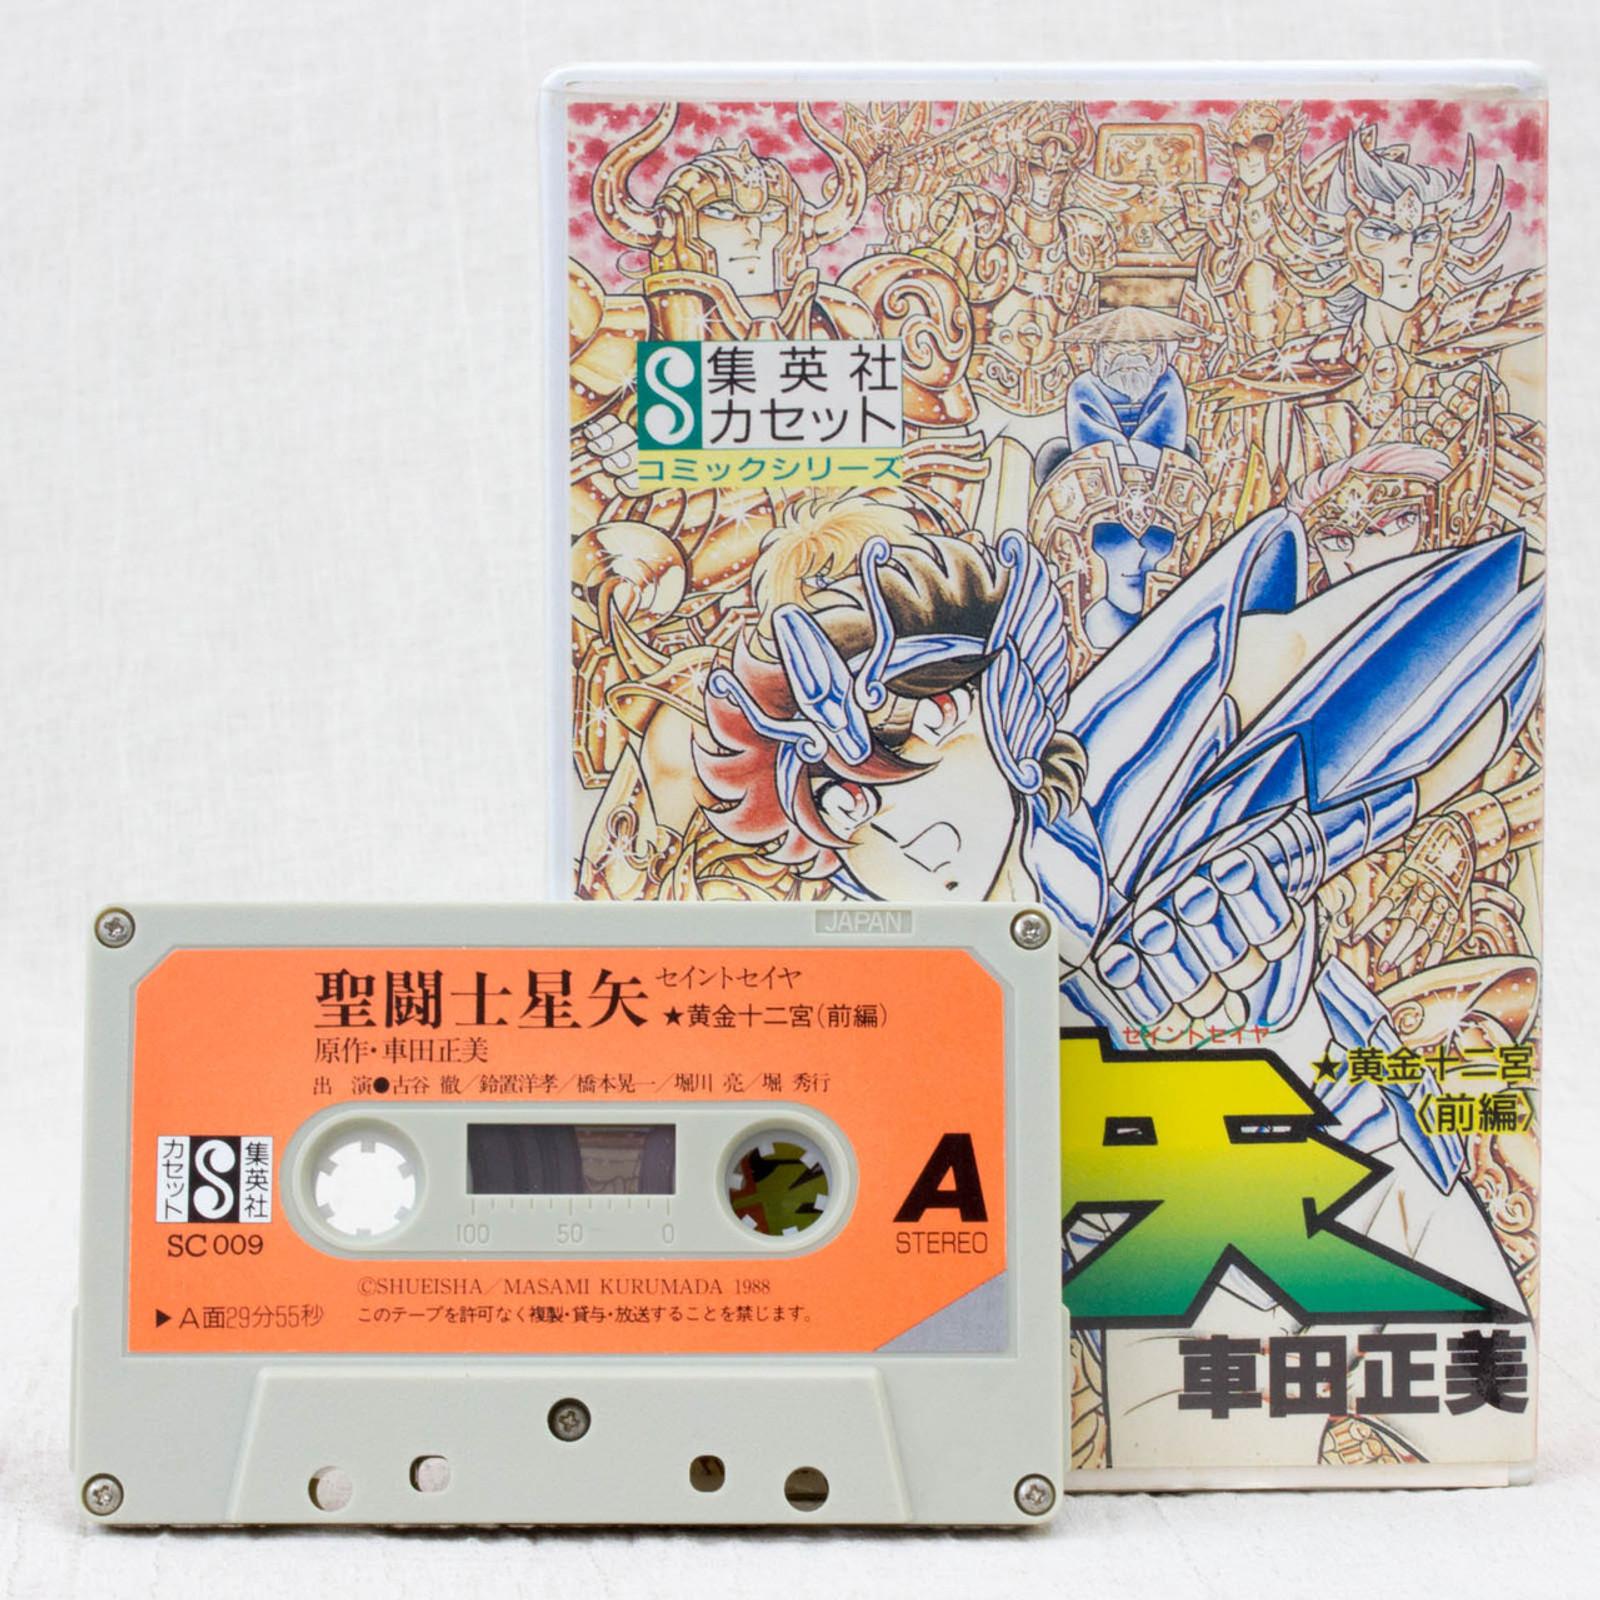 Saint Seiya Drama Casette Tape Ougon 12 Kyu Vol.1 JAPAN ANIME MANGA